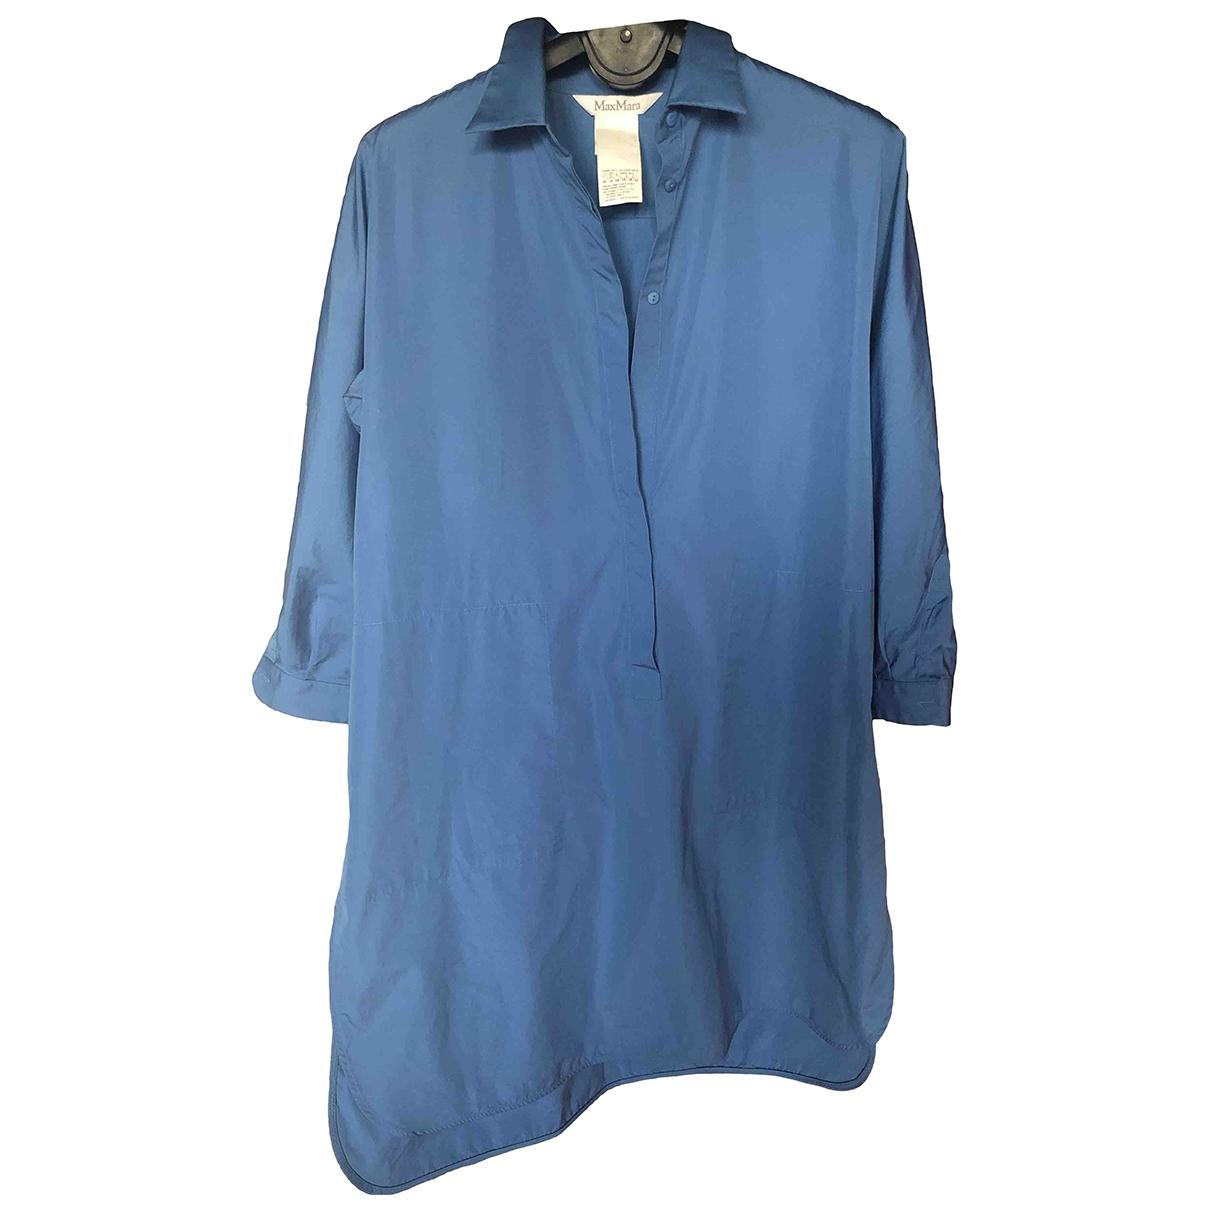 Max Mara \N Blue Cotton dress for Women 50-52 IT